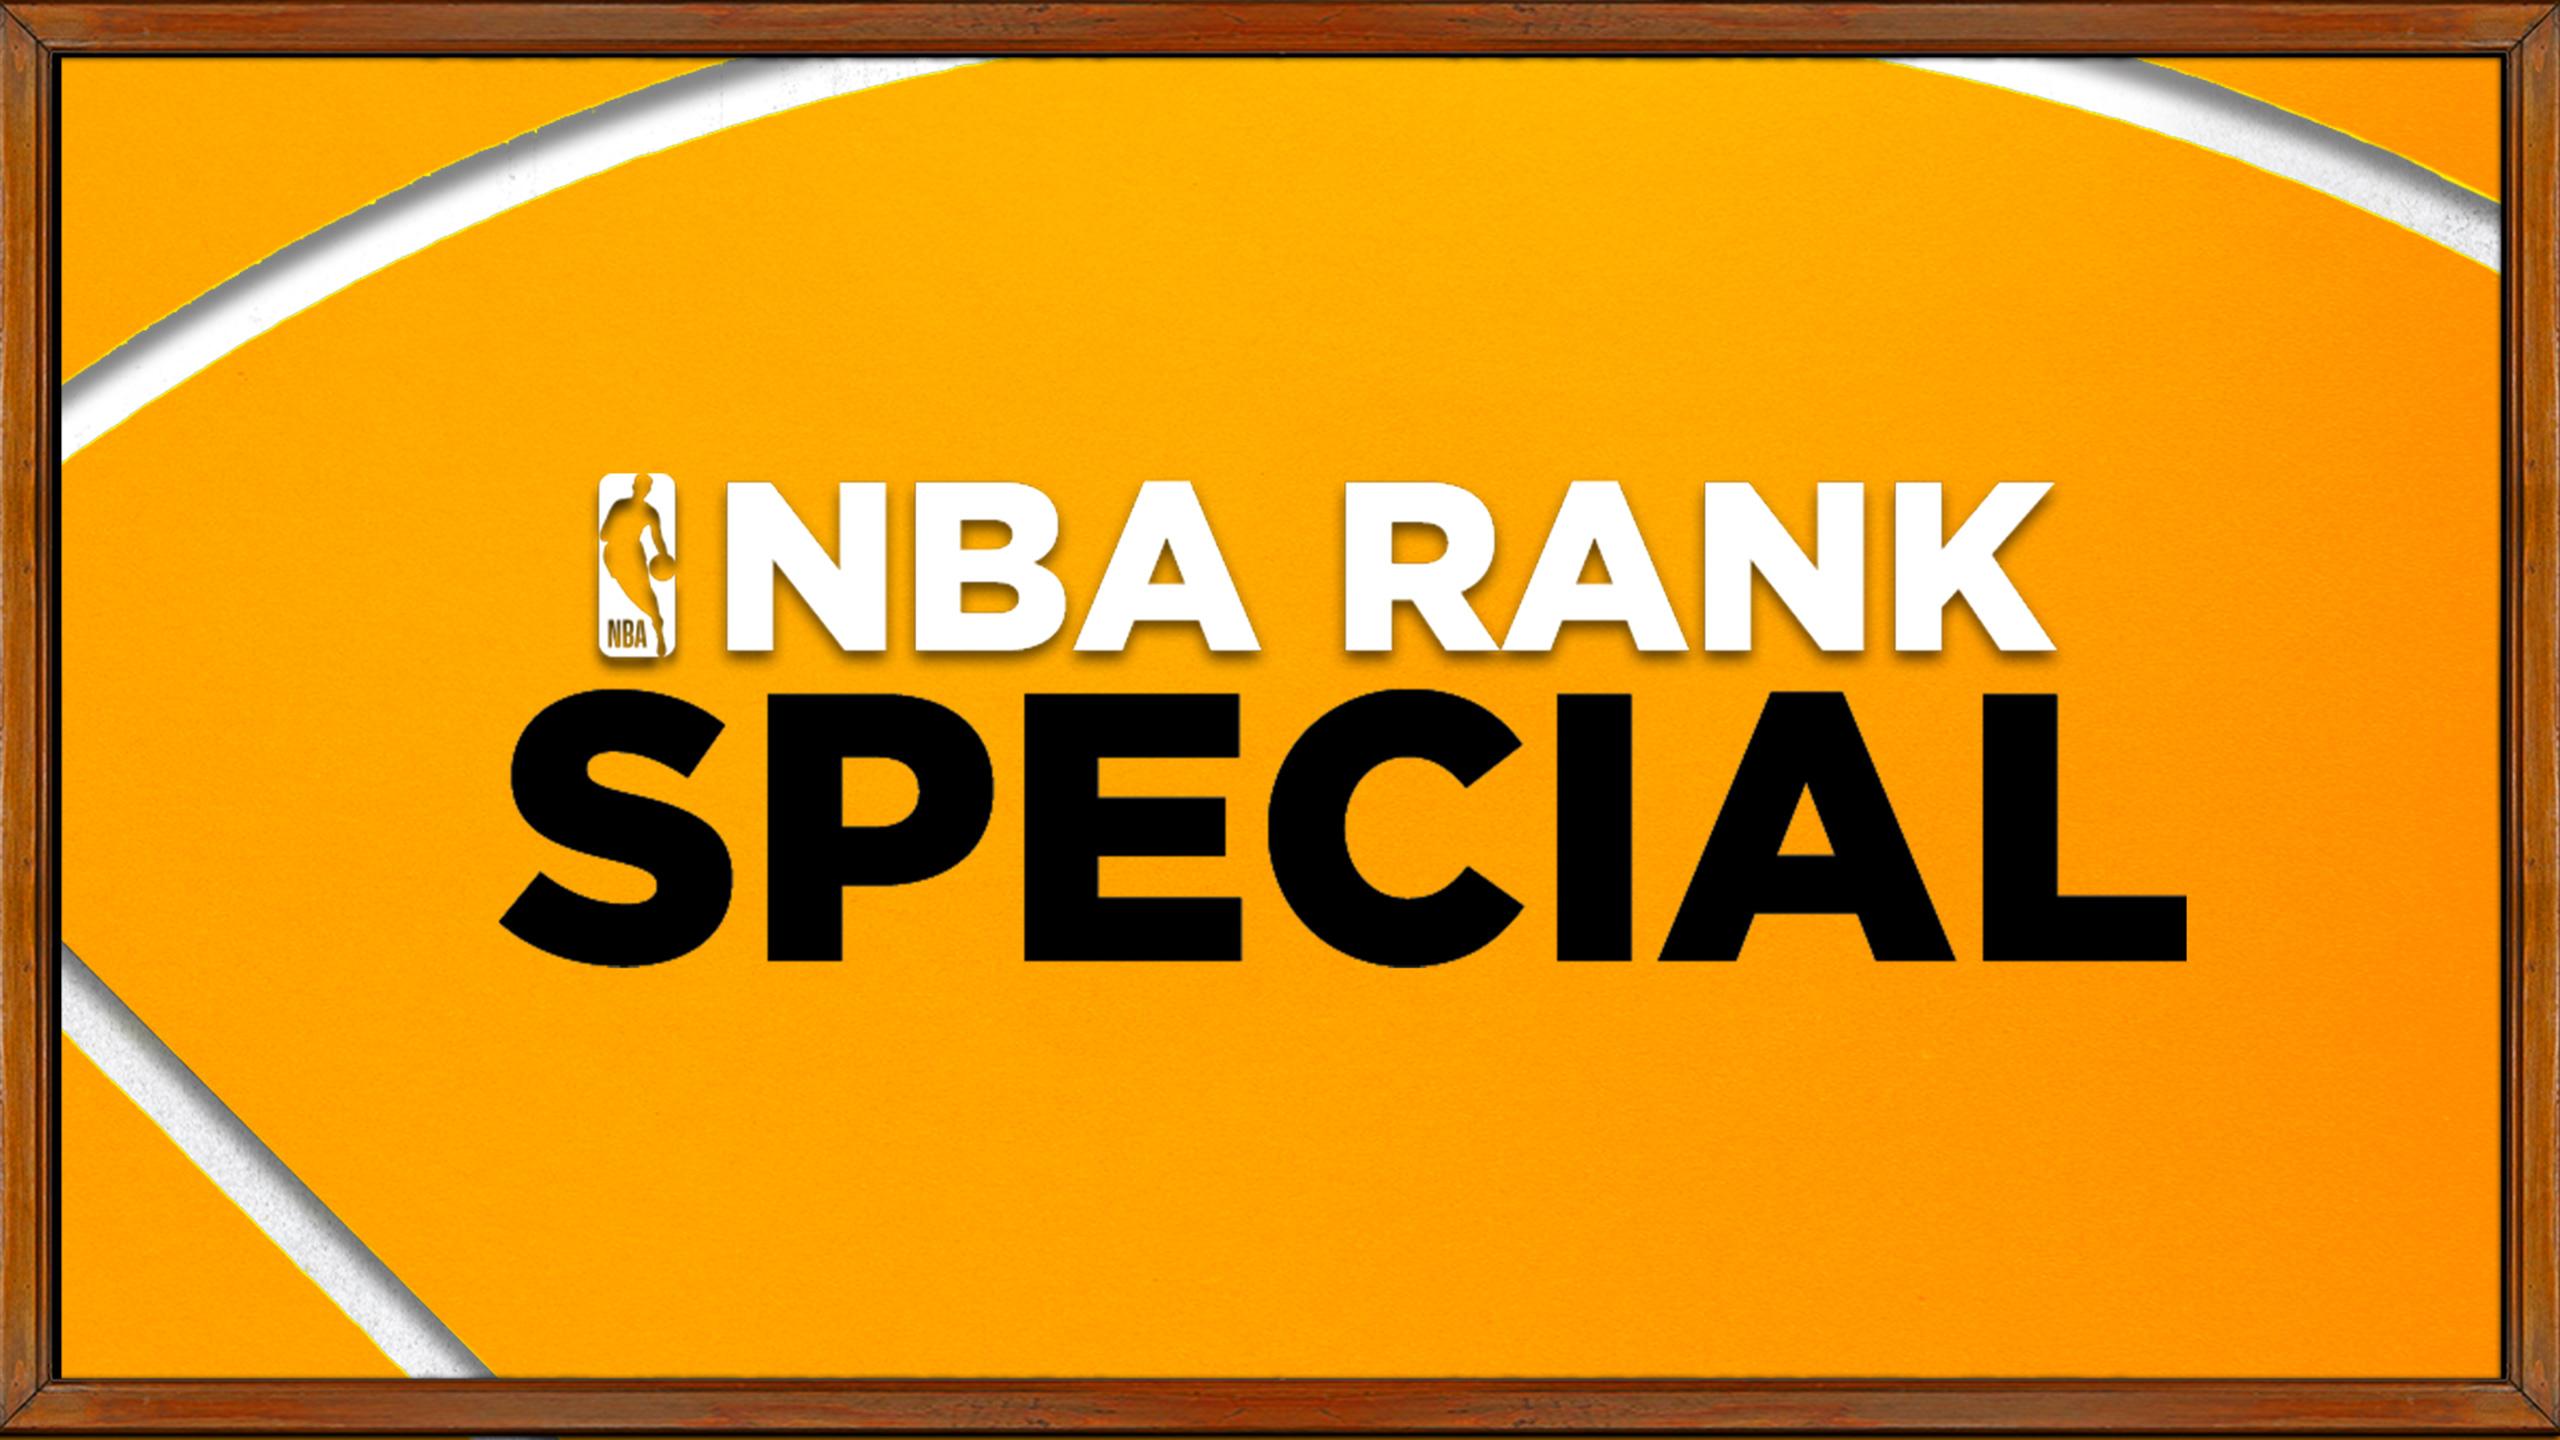 NBA Rank Special